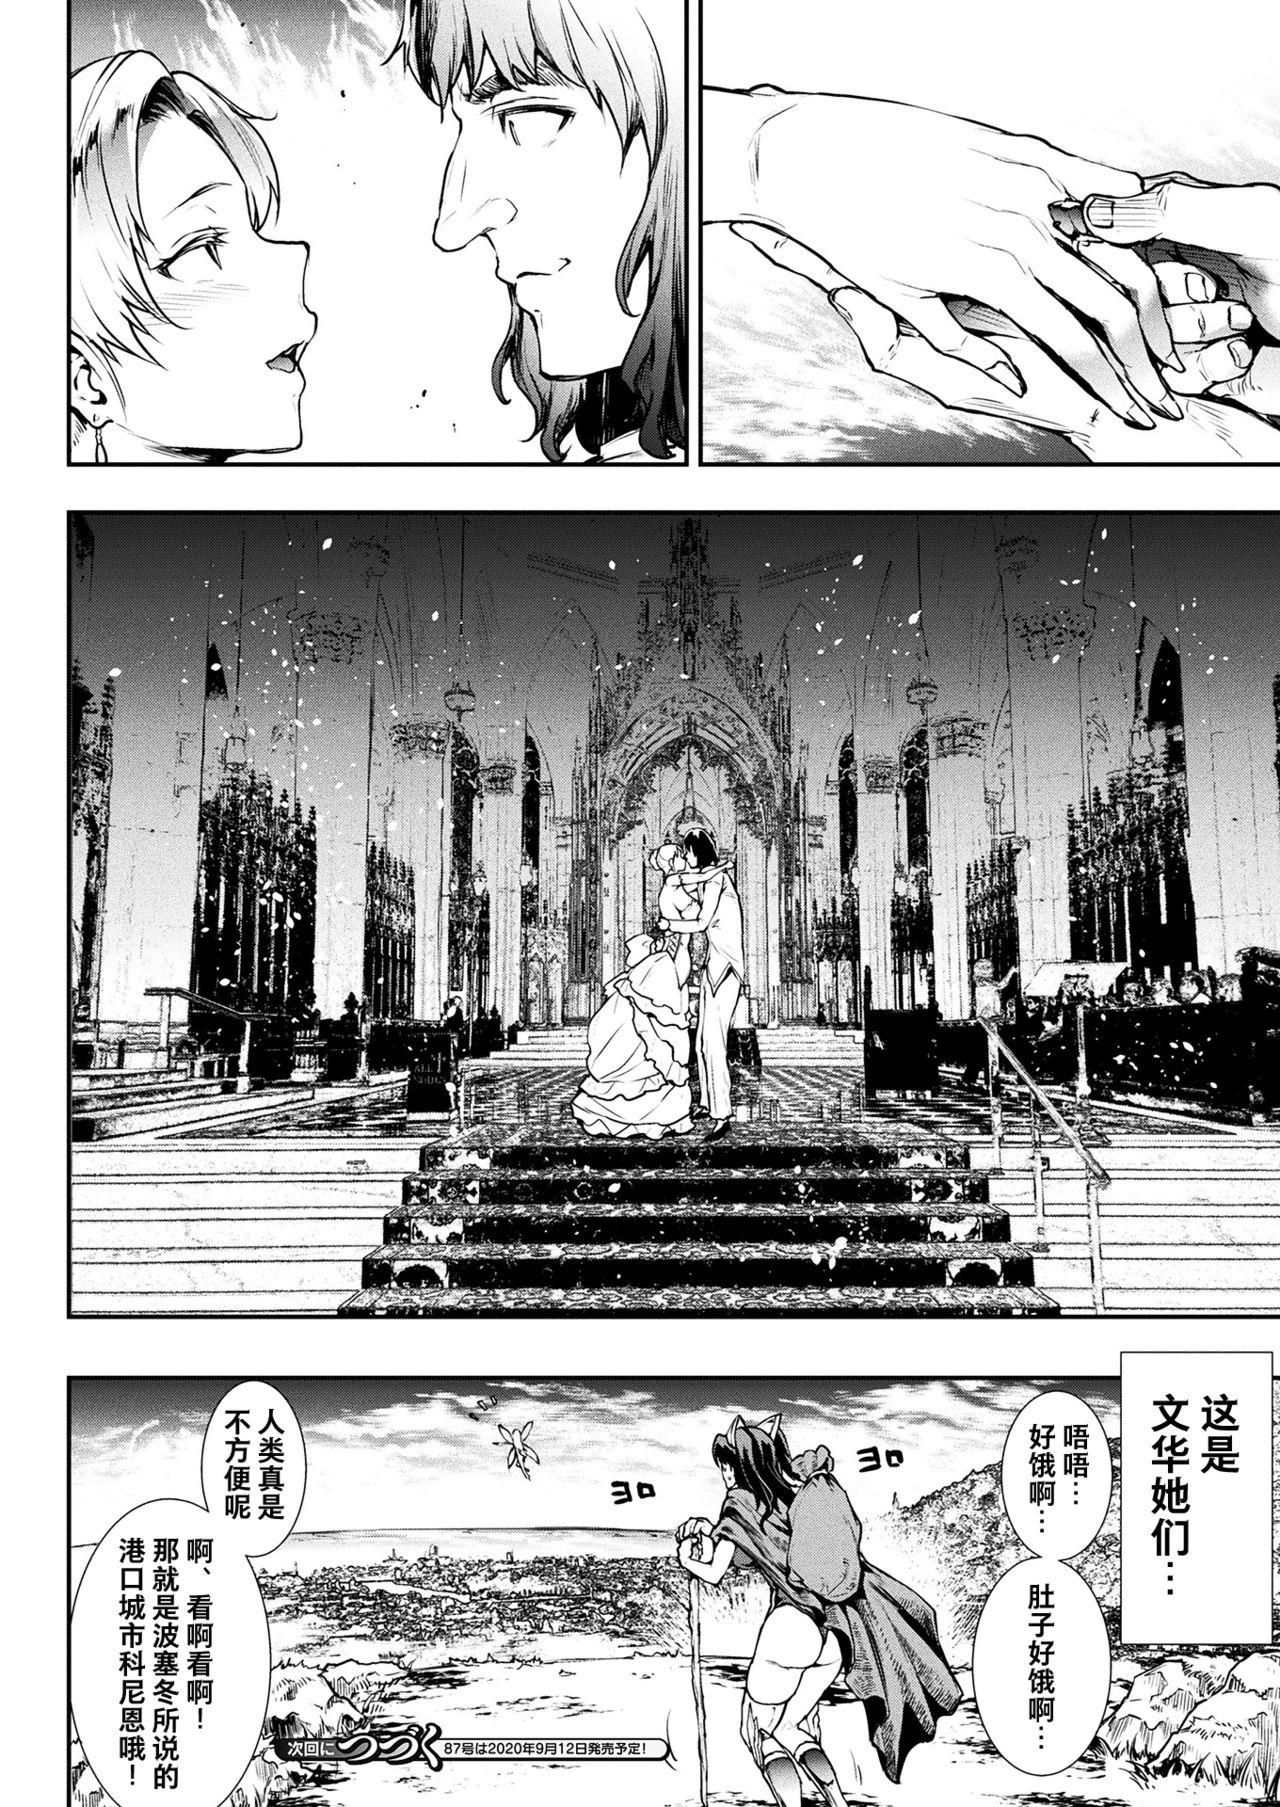 [Erect Sawaru] Raikou Shinki Igis Magia -PANDRA saga 3rd ignition- Ch. 24 (COMIC Unreal 2020-08 Vol. 86) [Chinese] [不咕鸟汉化组] [Digital] 25